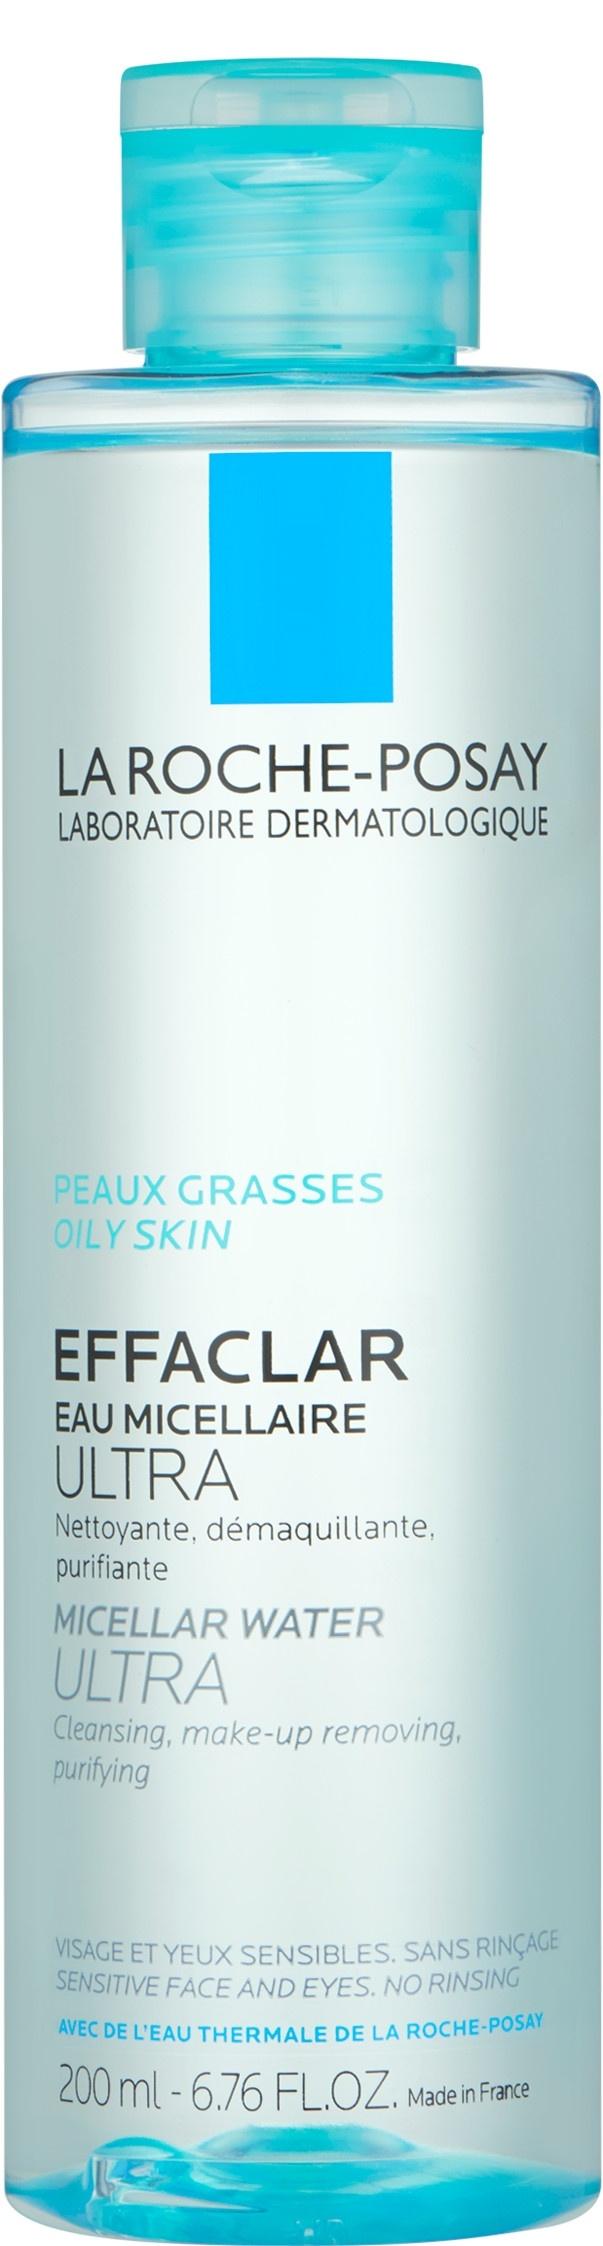 La Roche-Posay Effaclar Micellar Water Ultra - Oily Skin 200ml